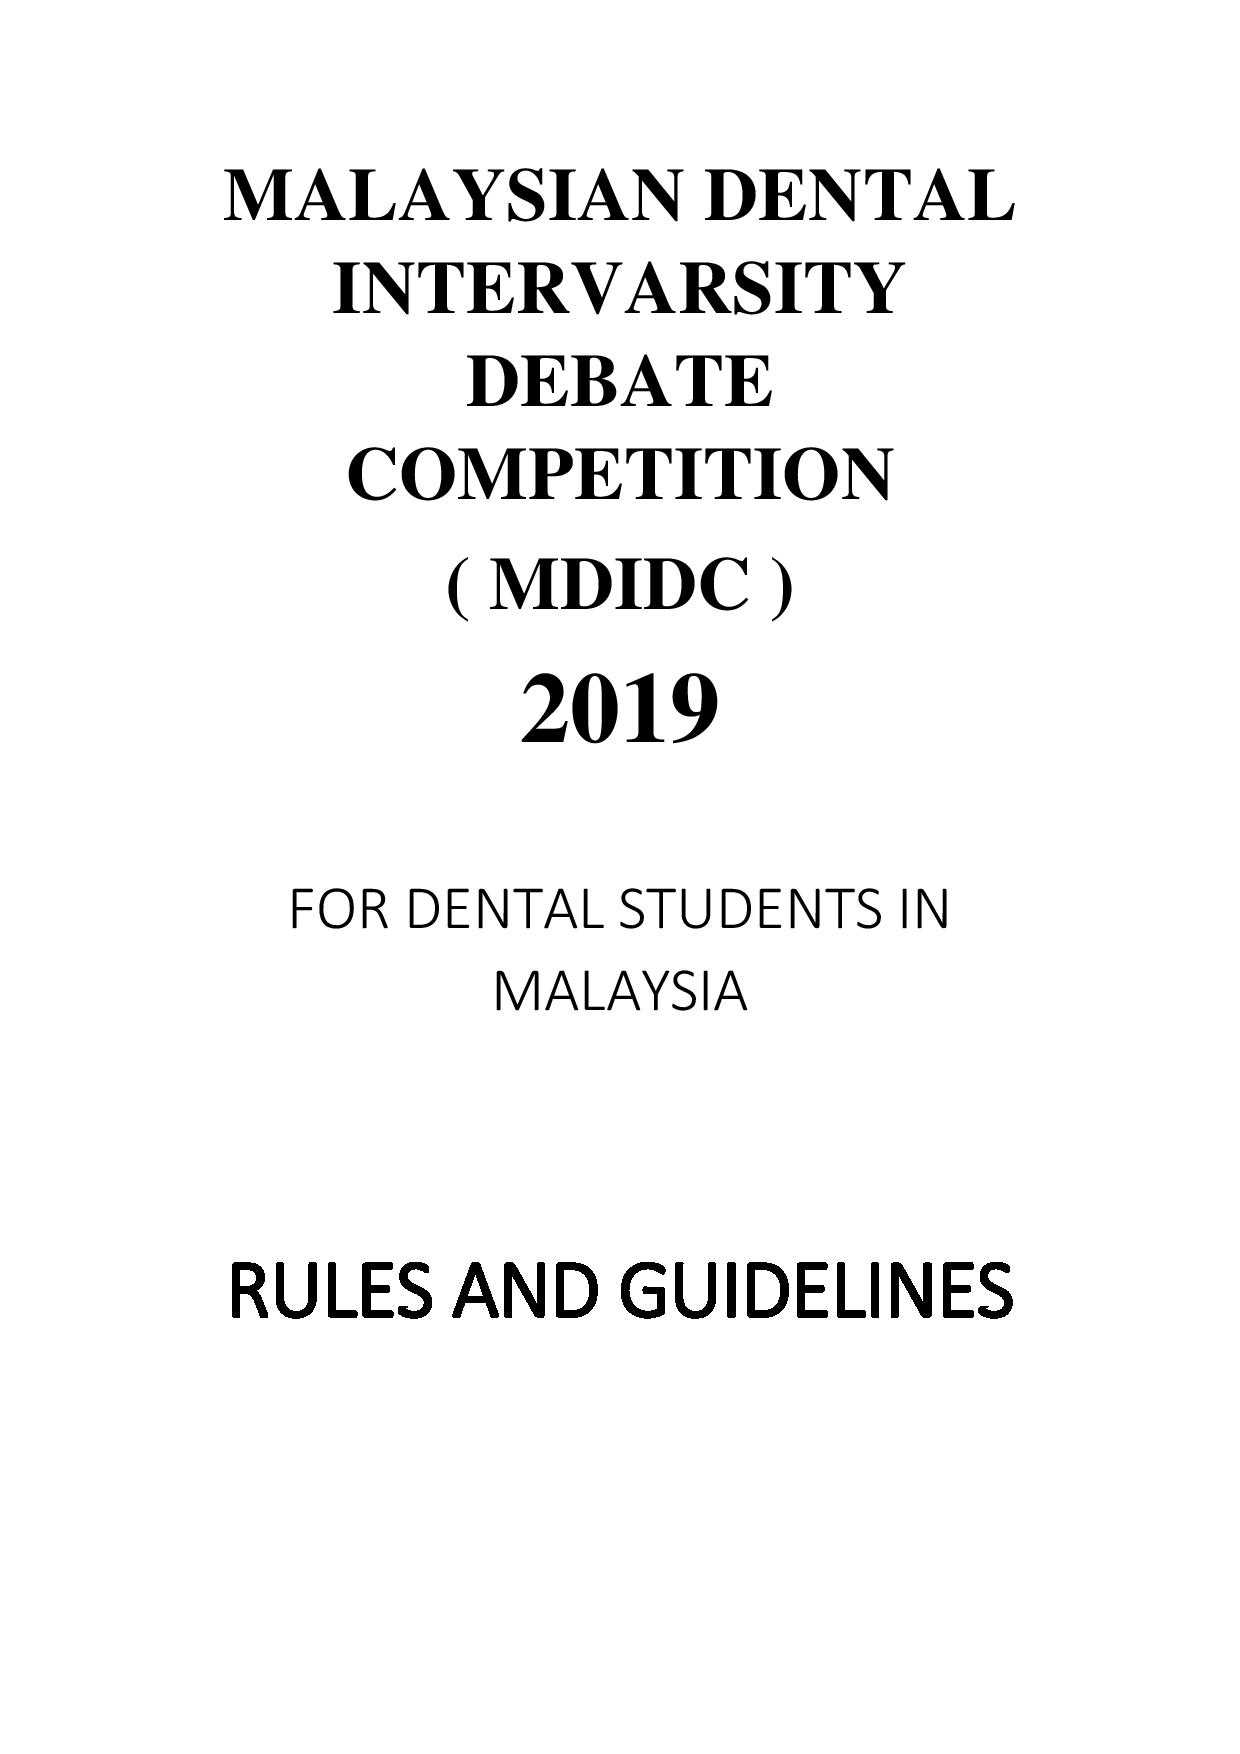 MALAYSIAN DENTAL INTERVARSITY DEBATE COMPETITION (Edited)-page-001.jpg